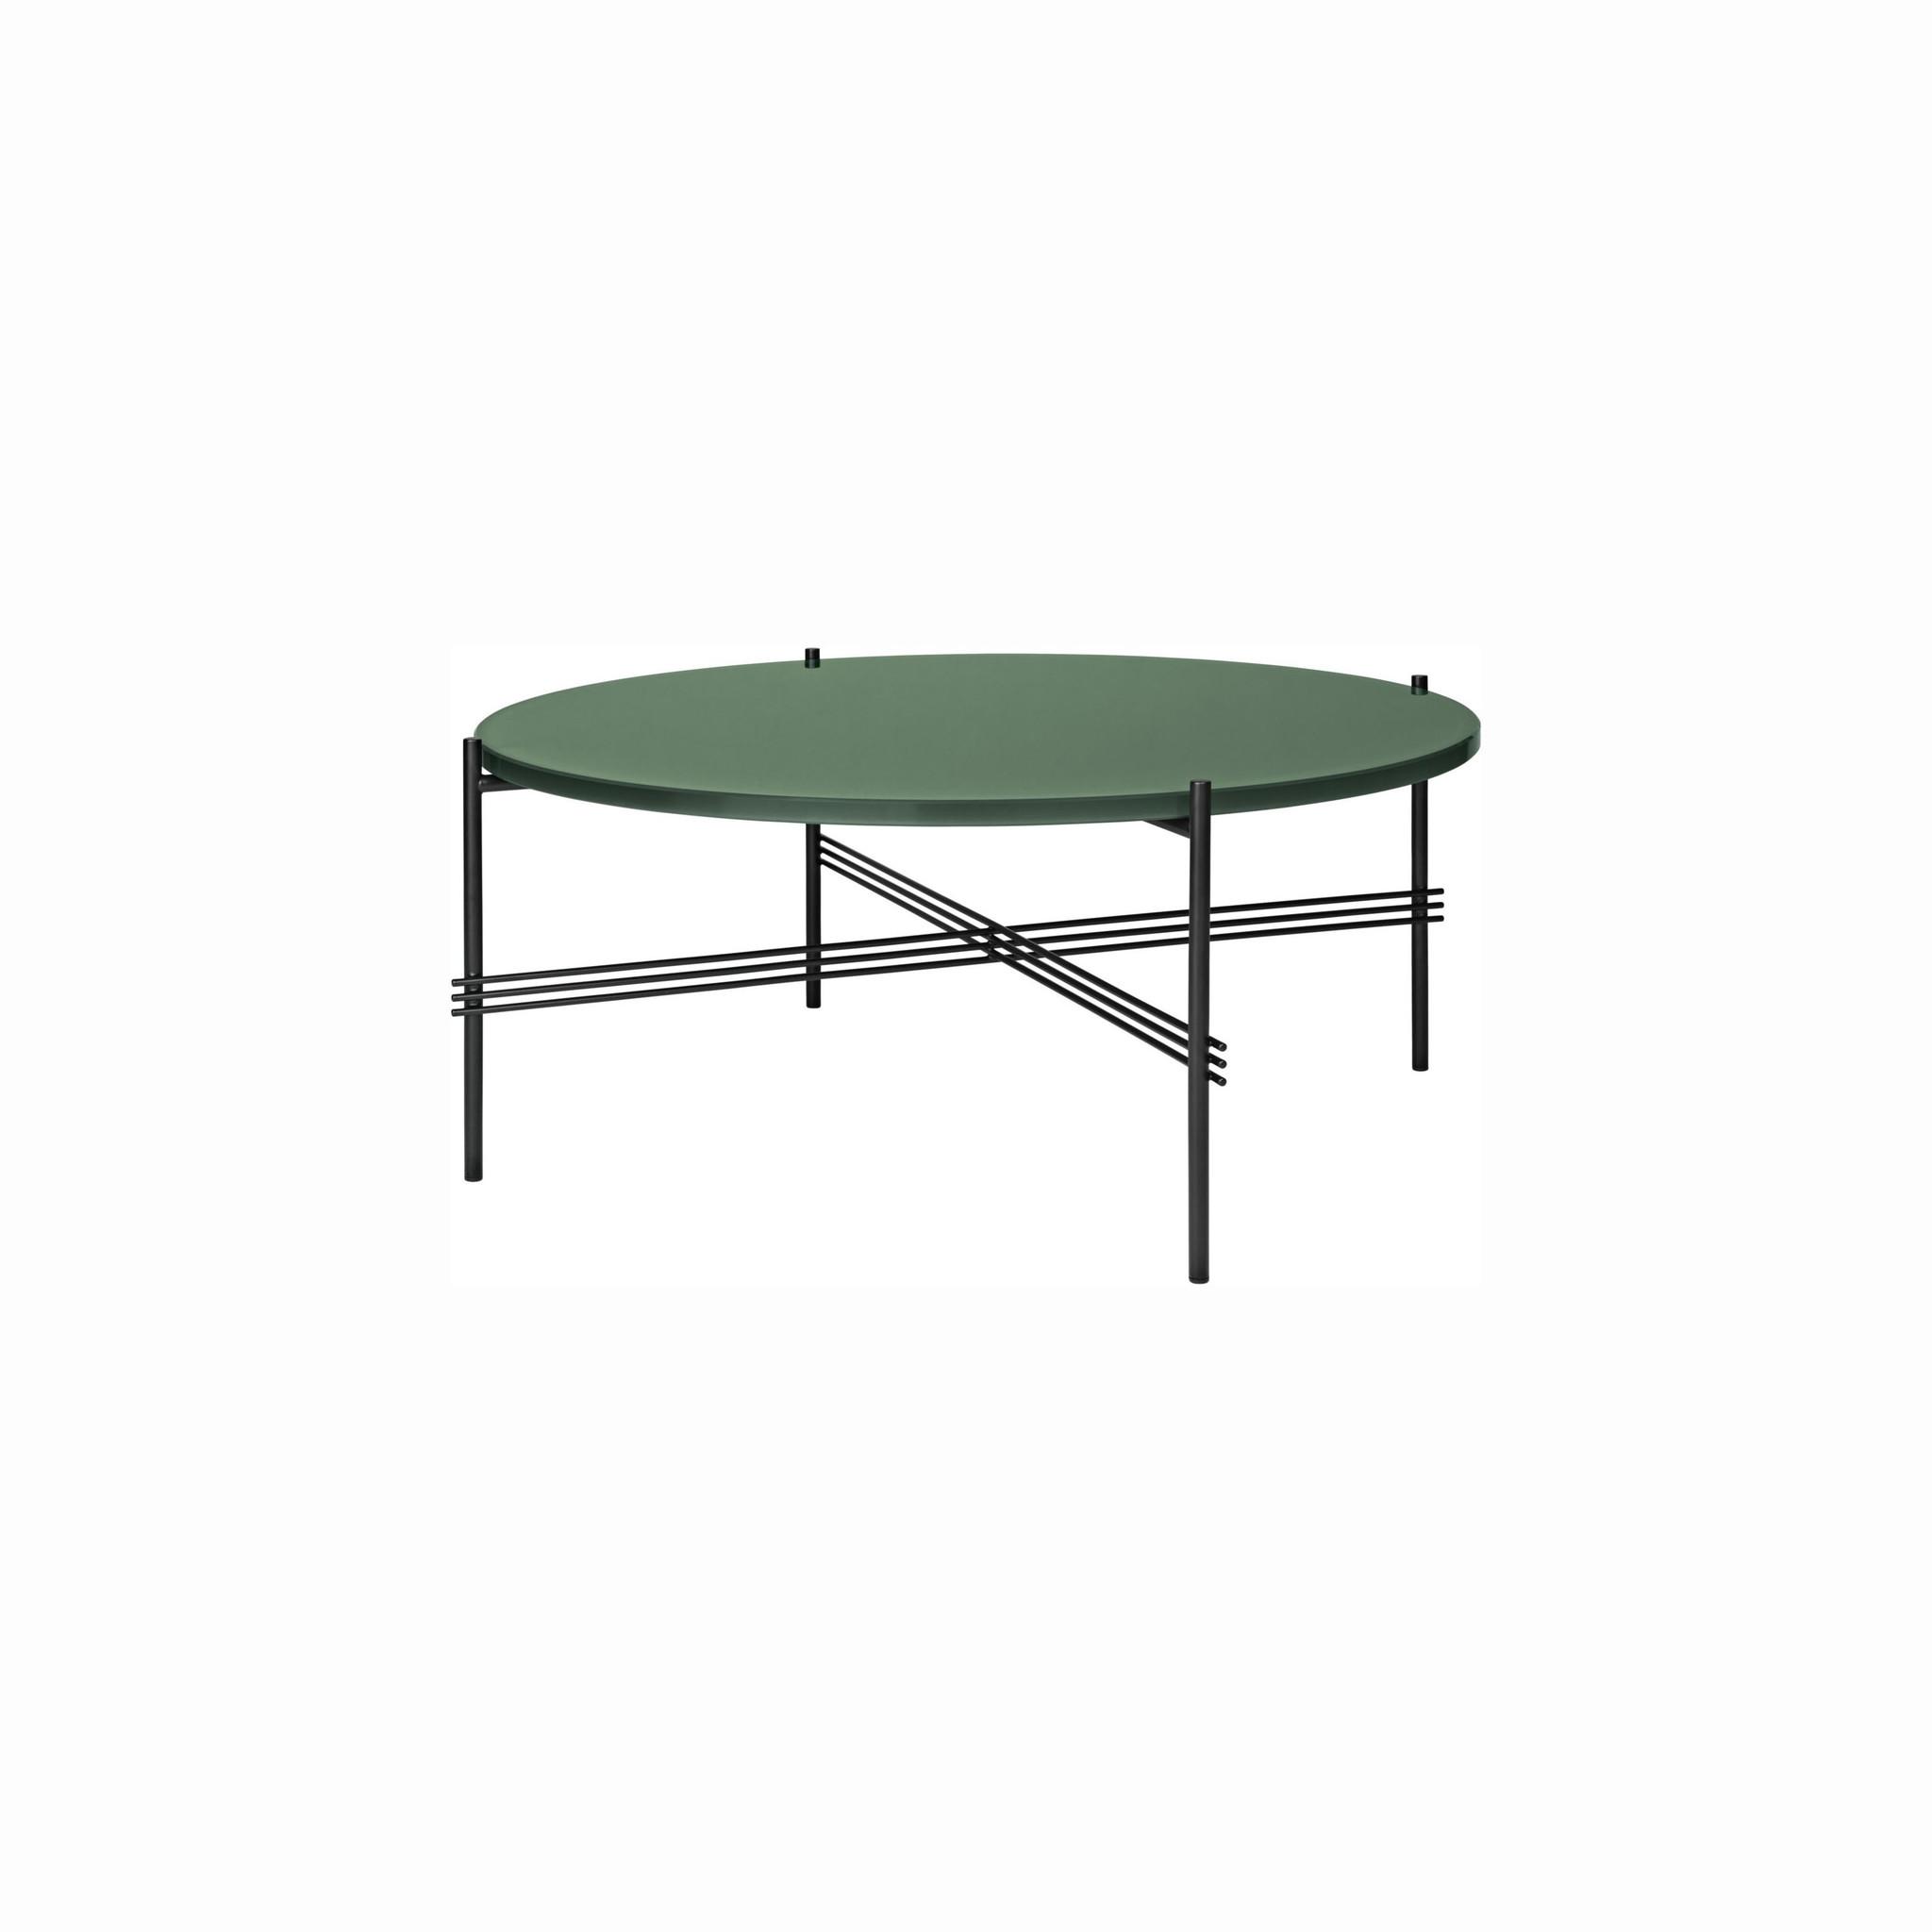 Gubi TS Coffee Table - Round, 80cm